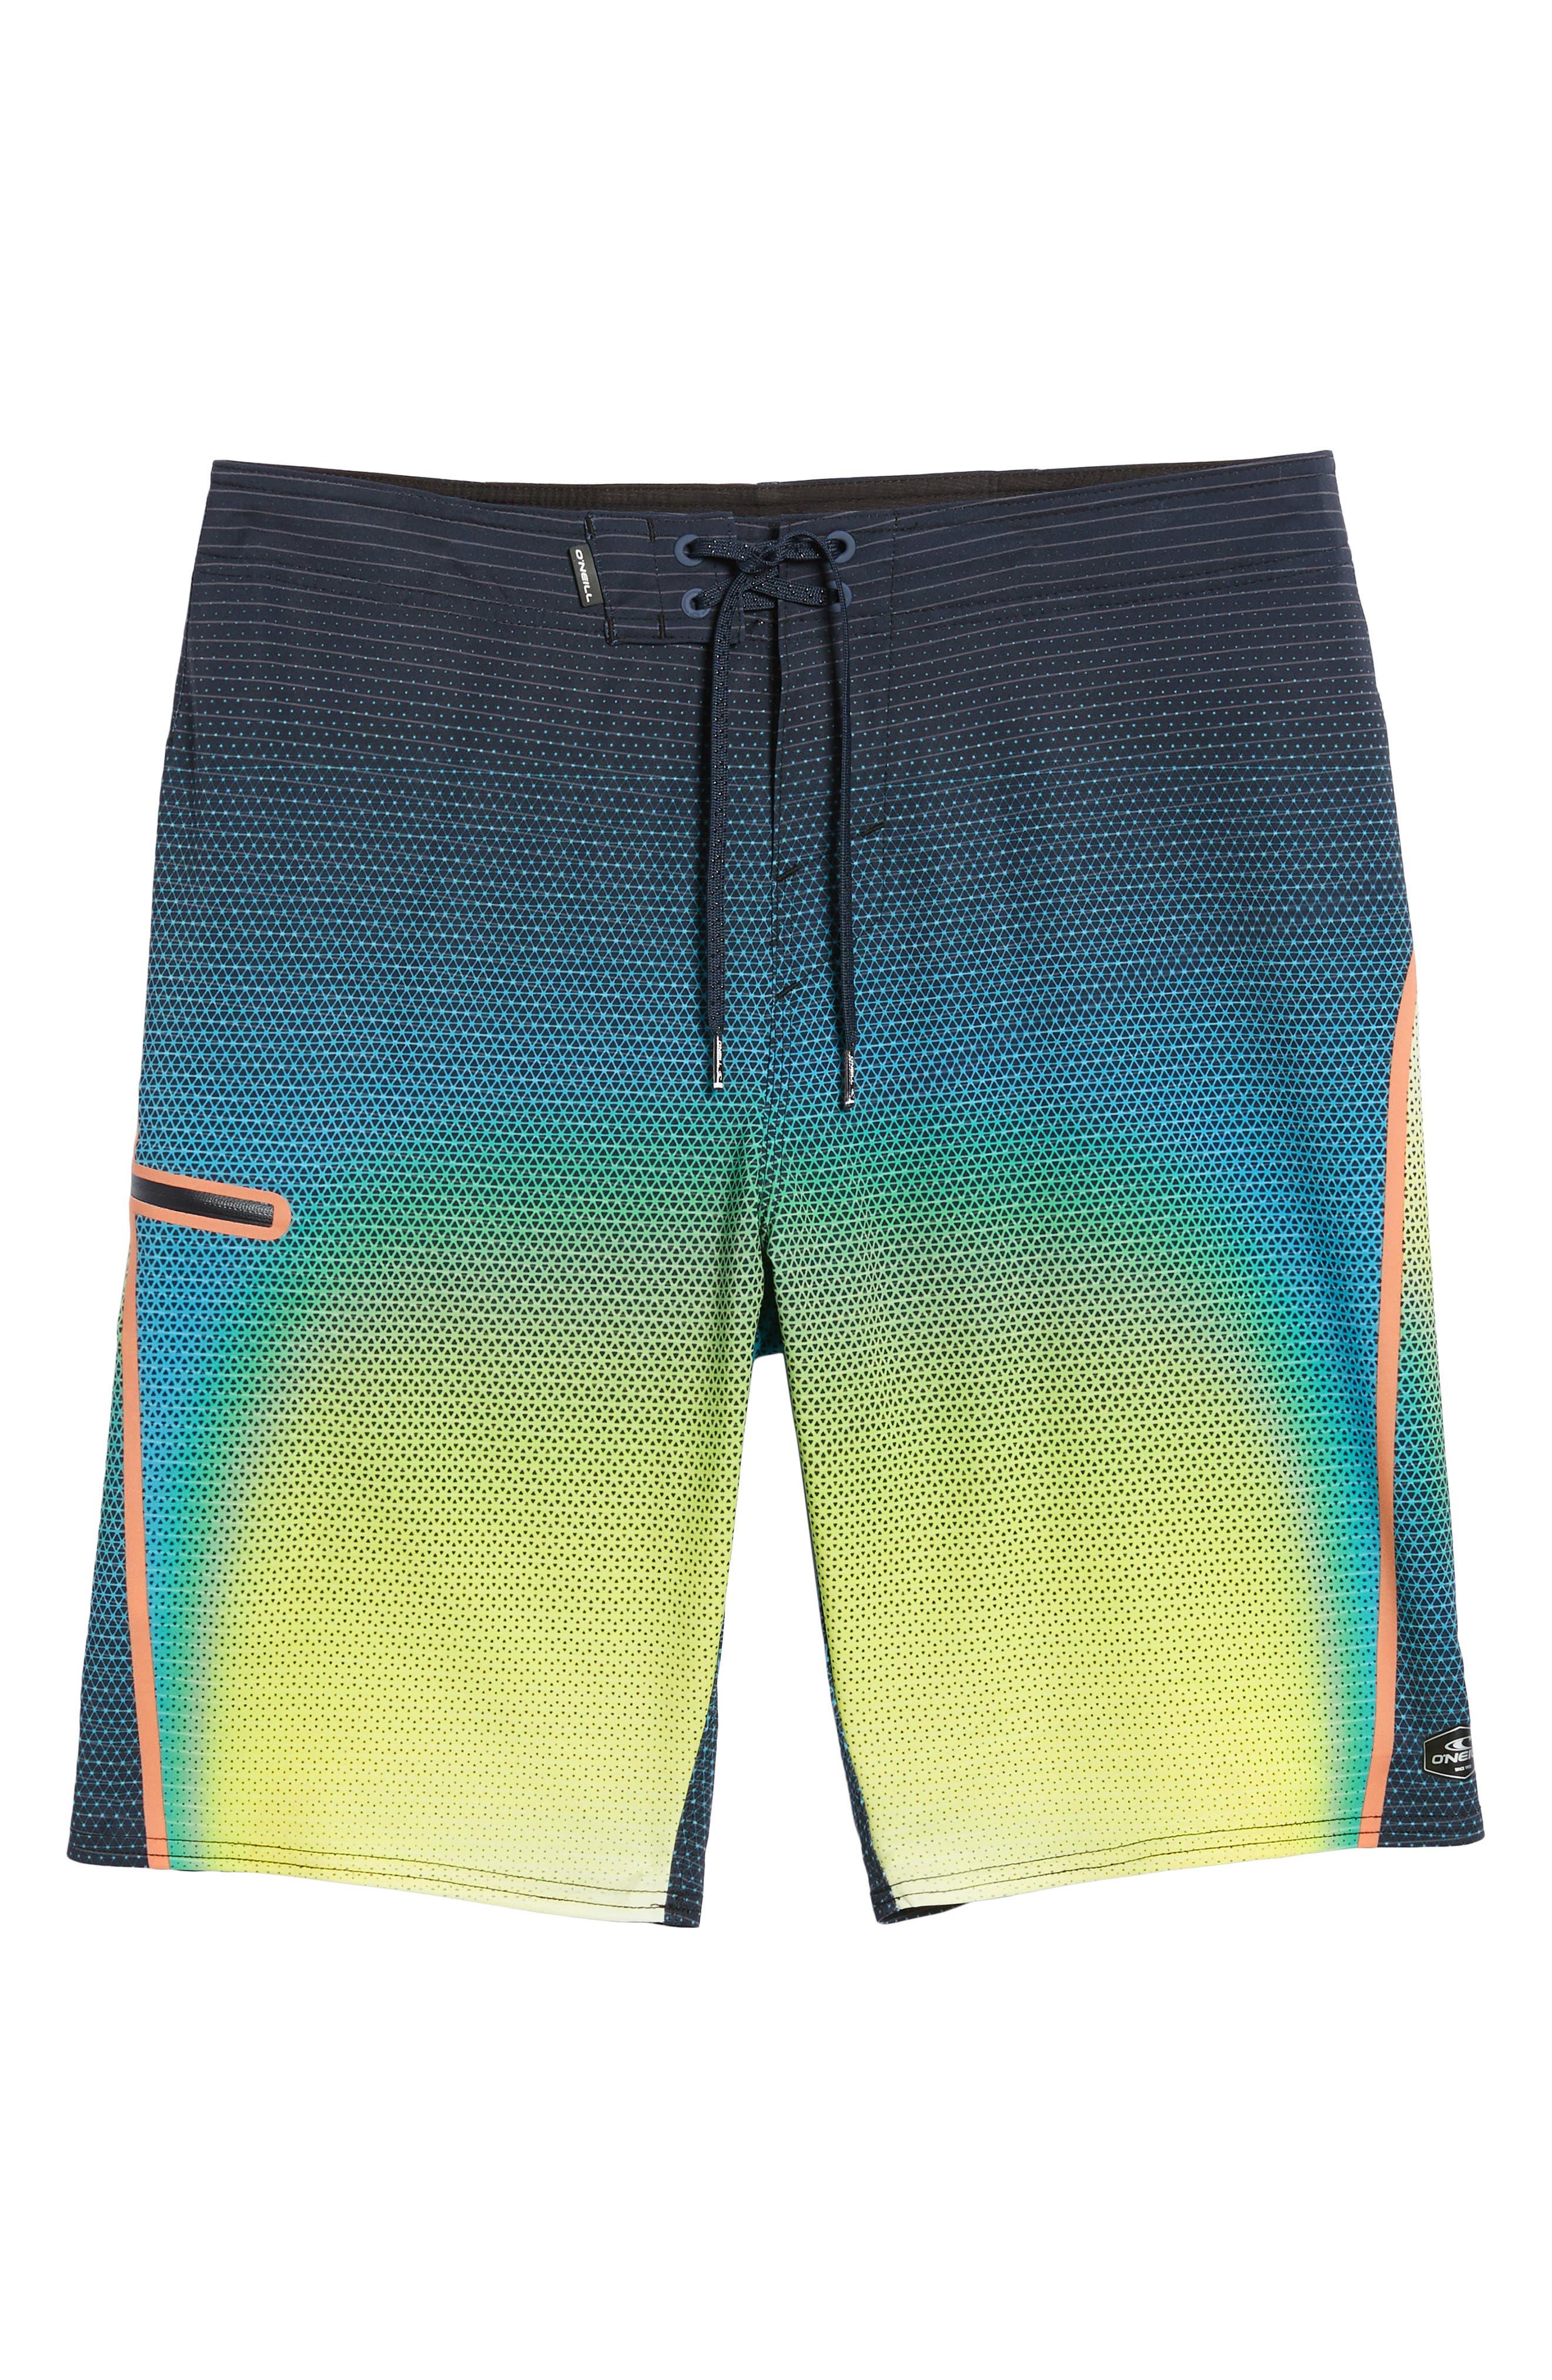 Hyperfreak Prizma Board Shorts,                             Alternate thumbnail 6, color,                             Ocean